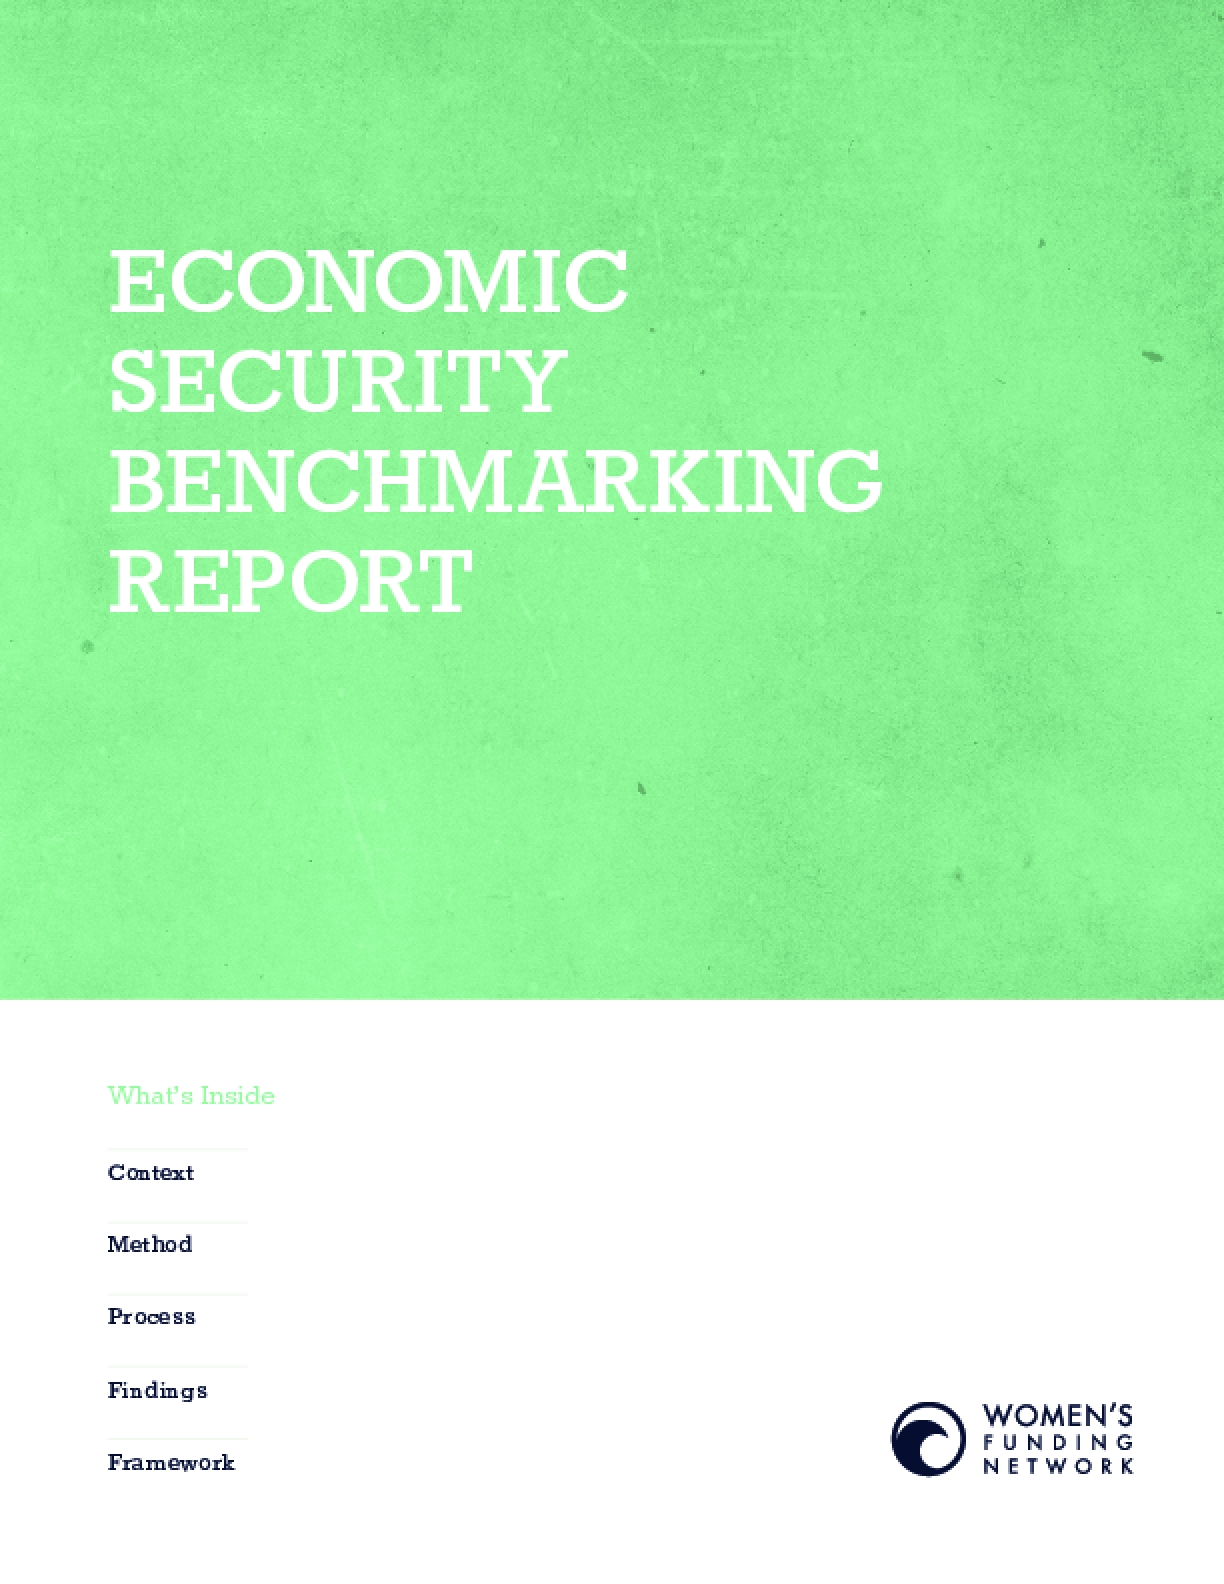 Economic Security Benchmarking Report